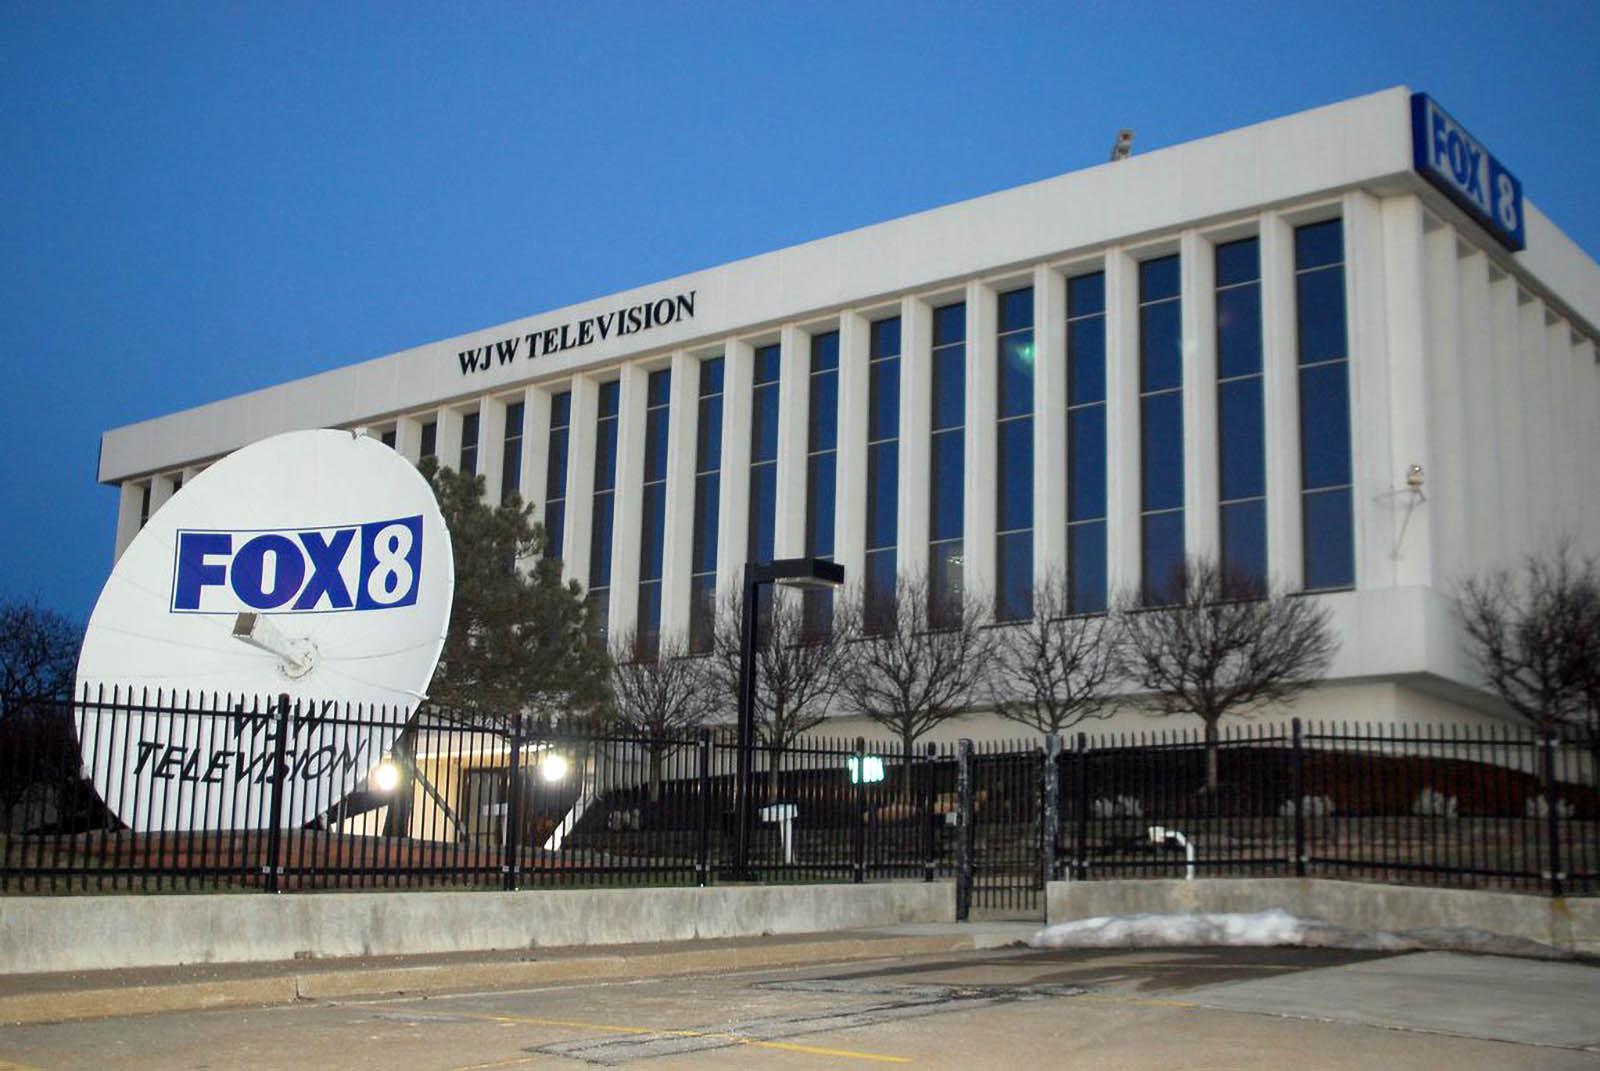 Fox 8 News Cleveland News Studio Building